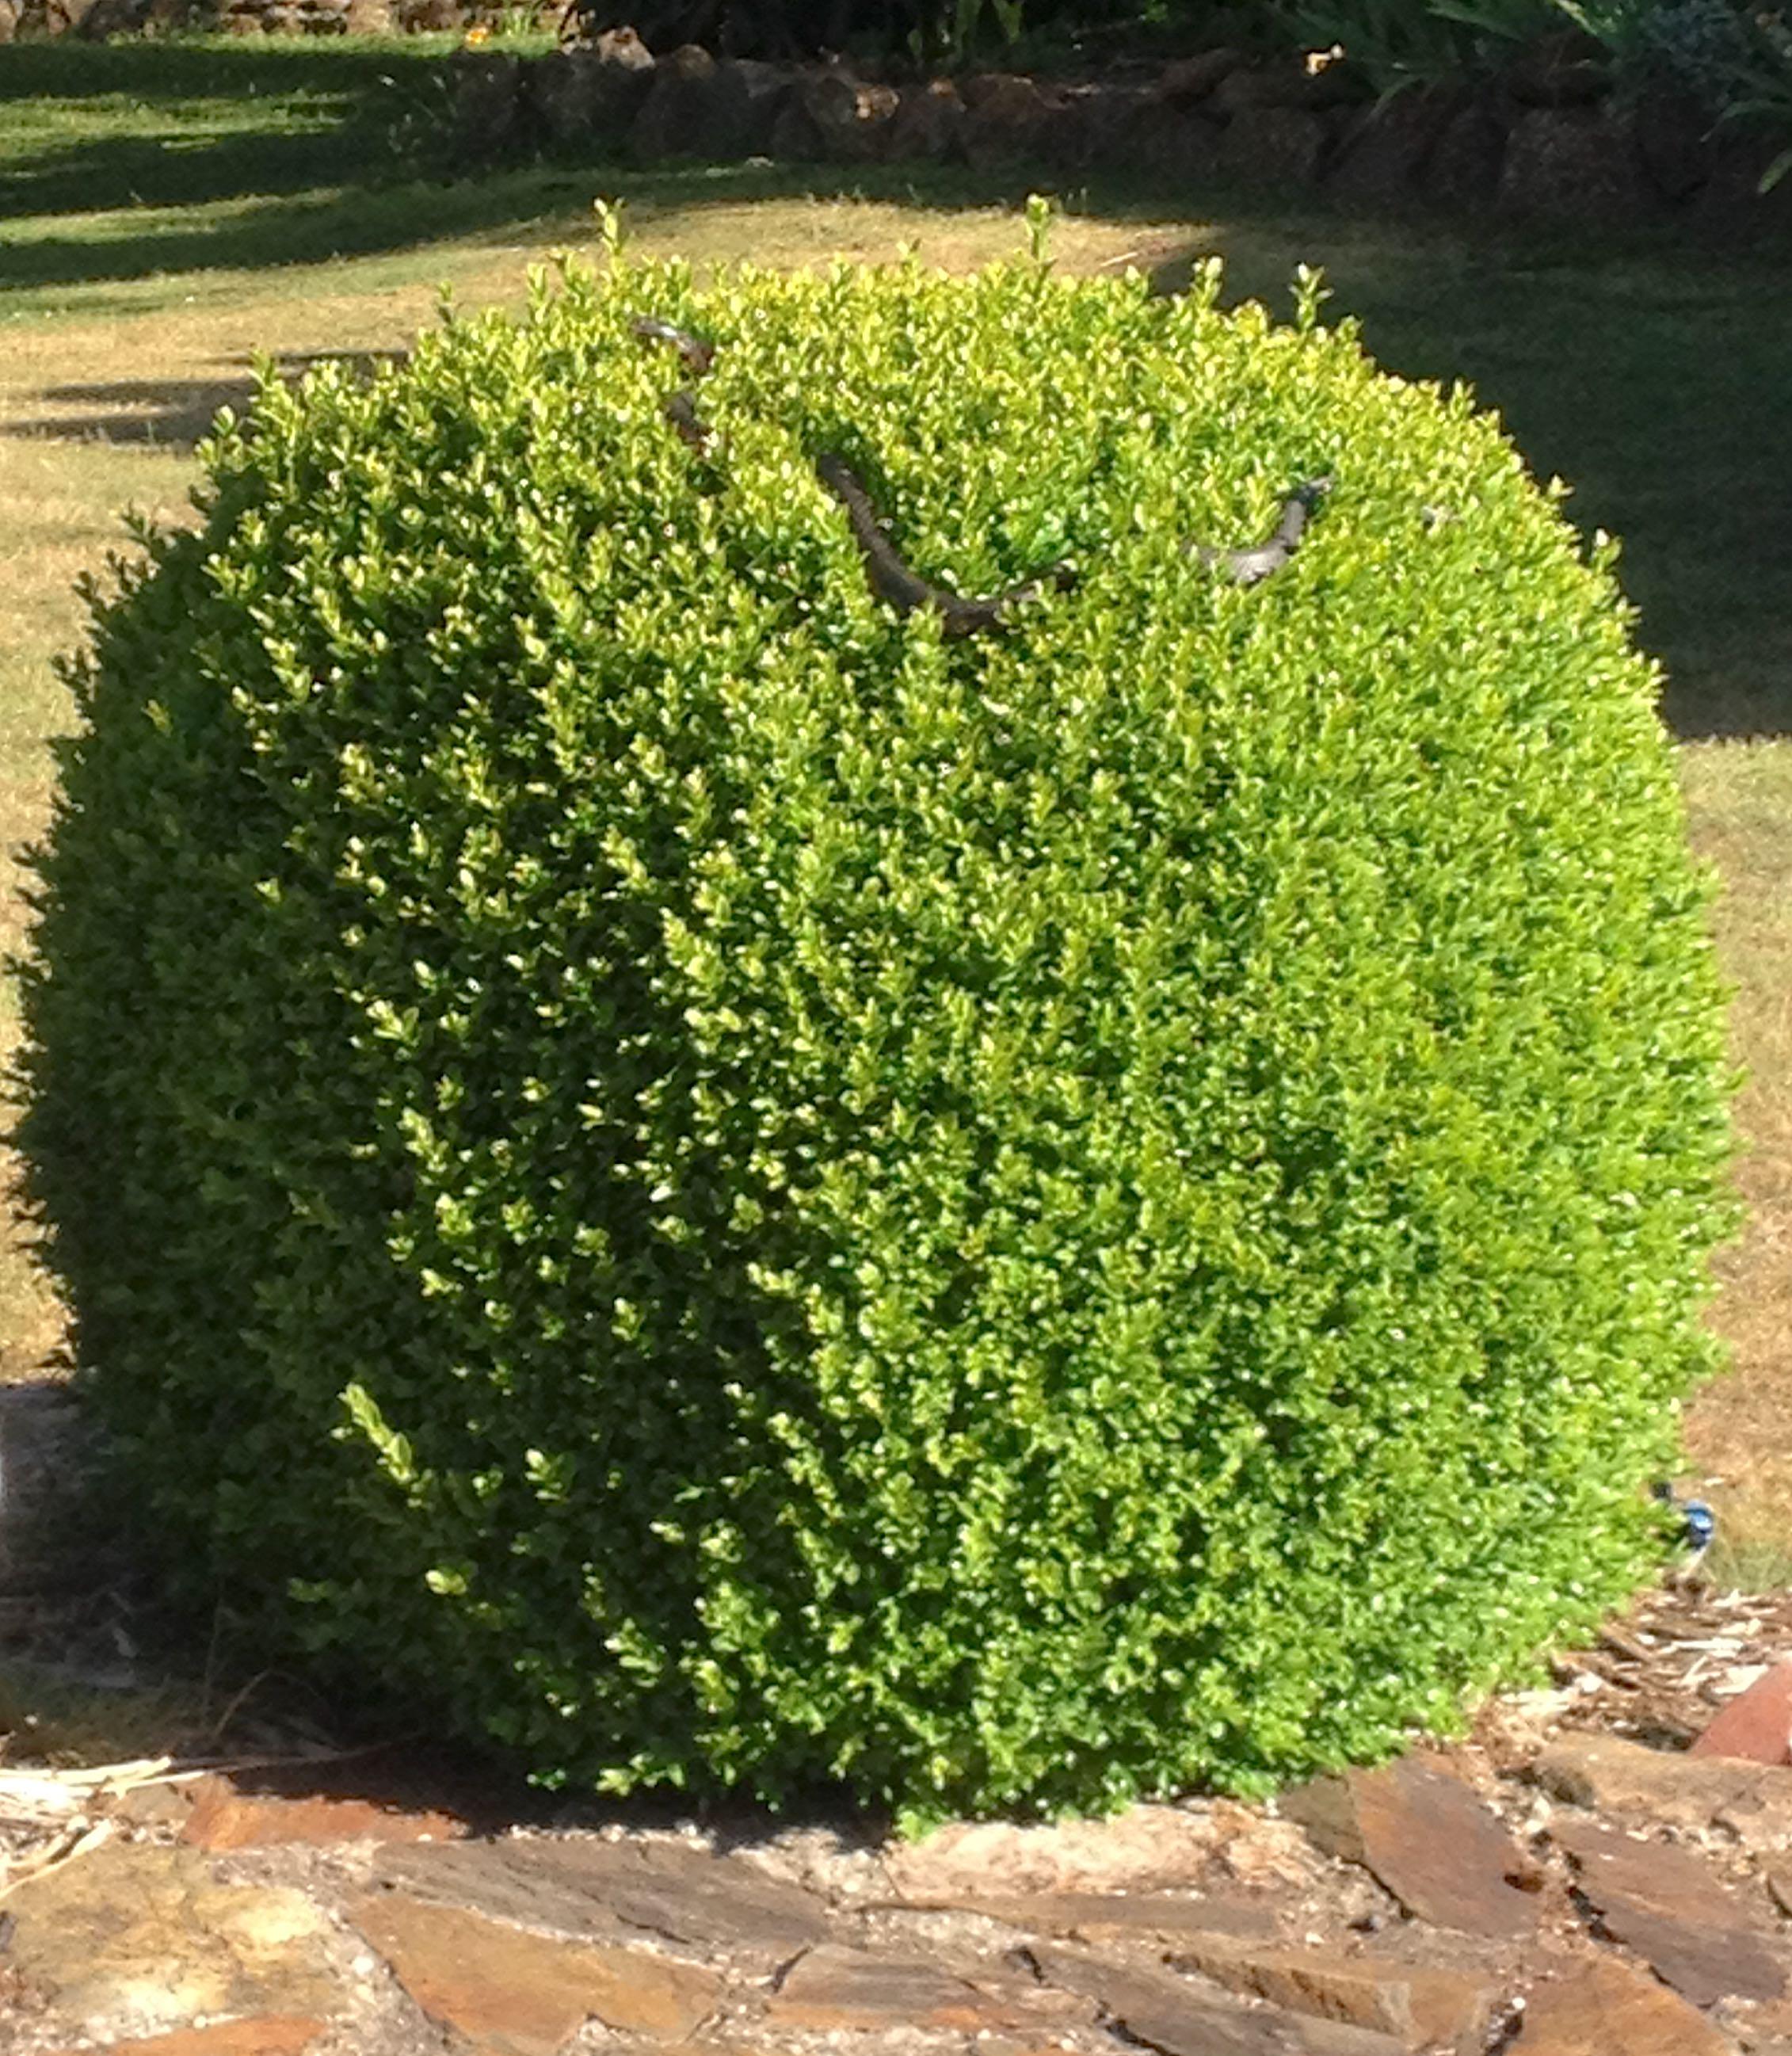 1.snake atop bush